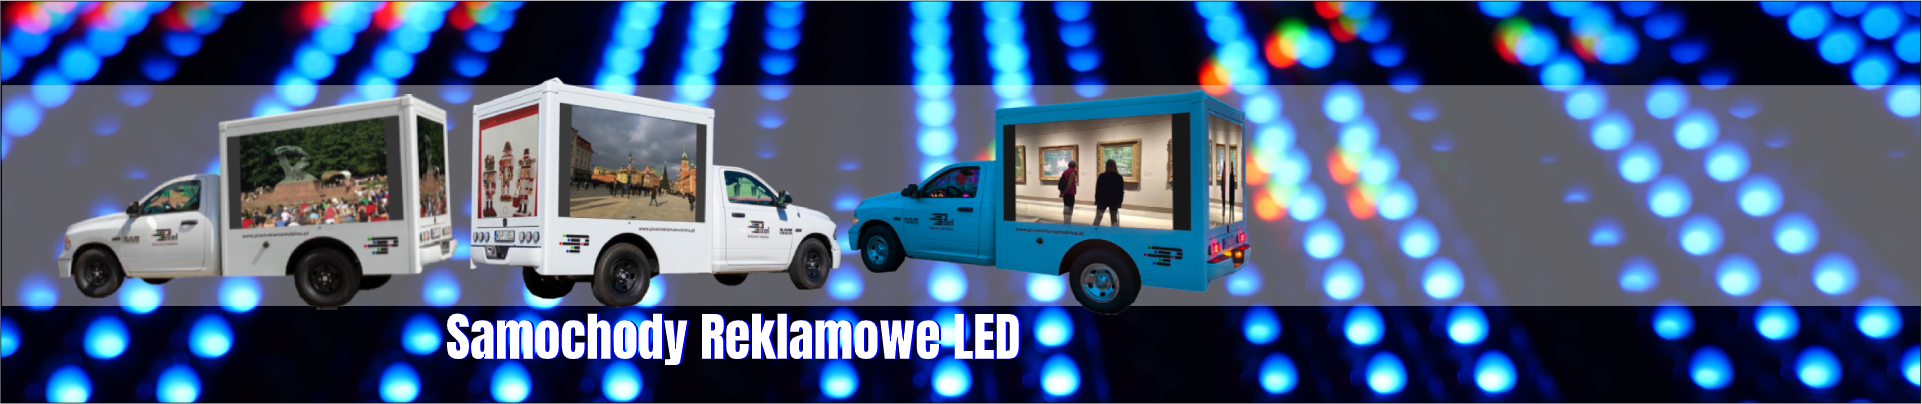 samochody_reklamowe_LED_8